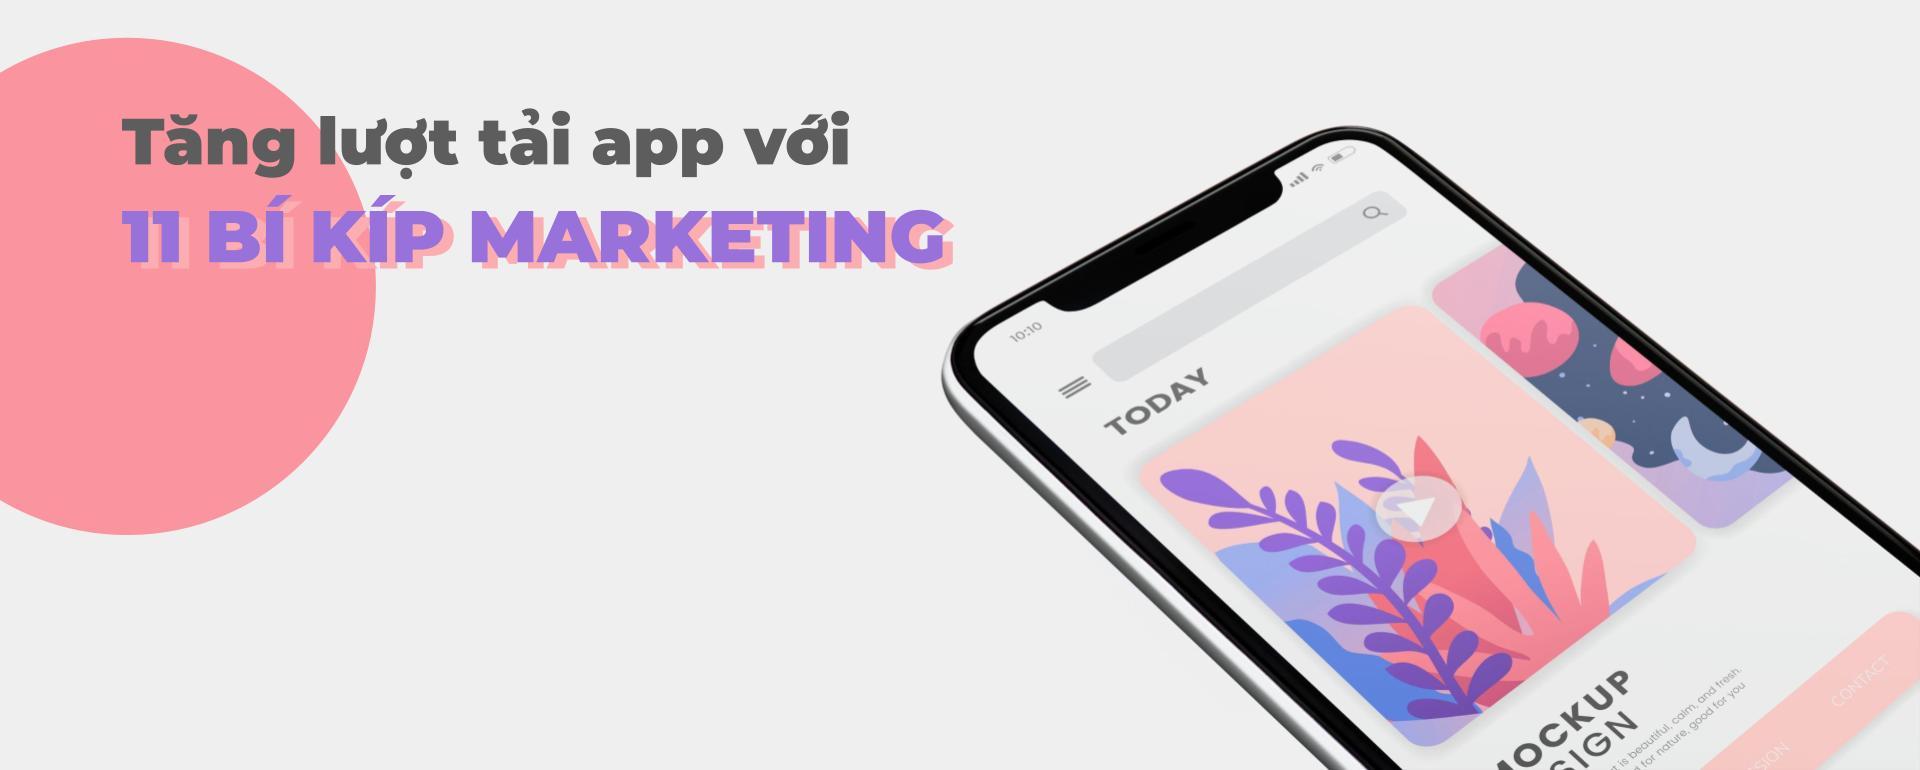 tang luot tai app voi 11 bi kip marketing 5